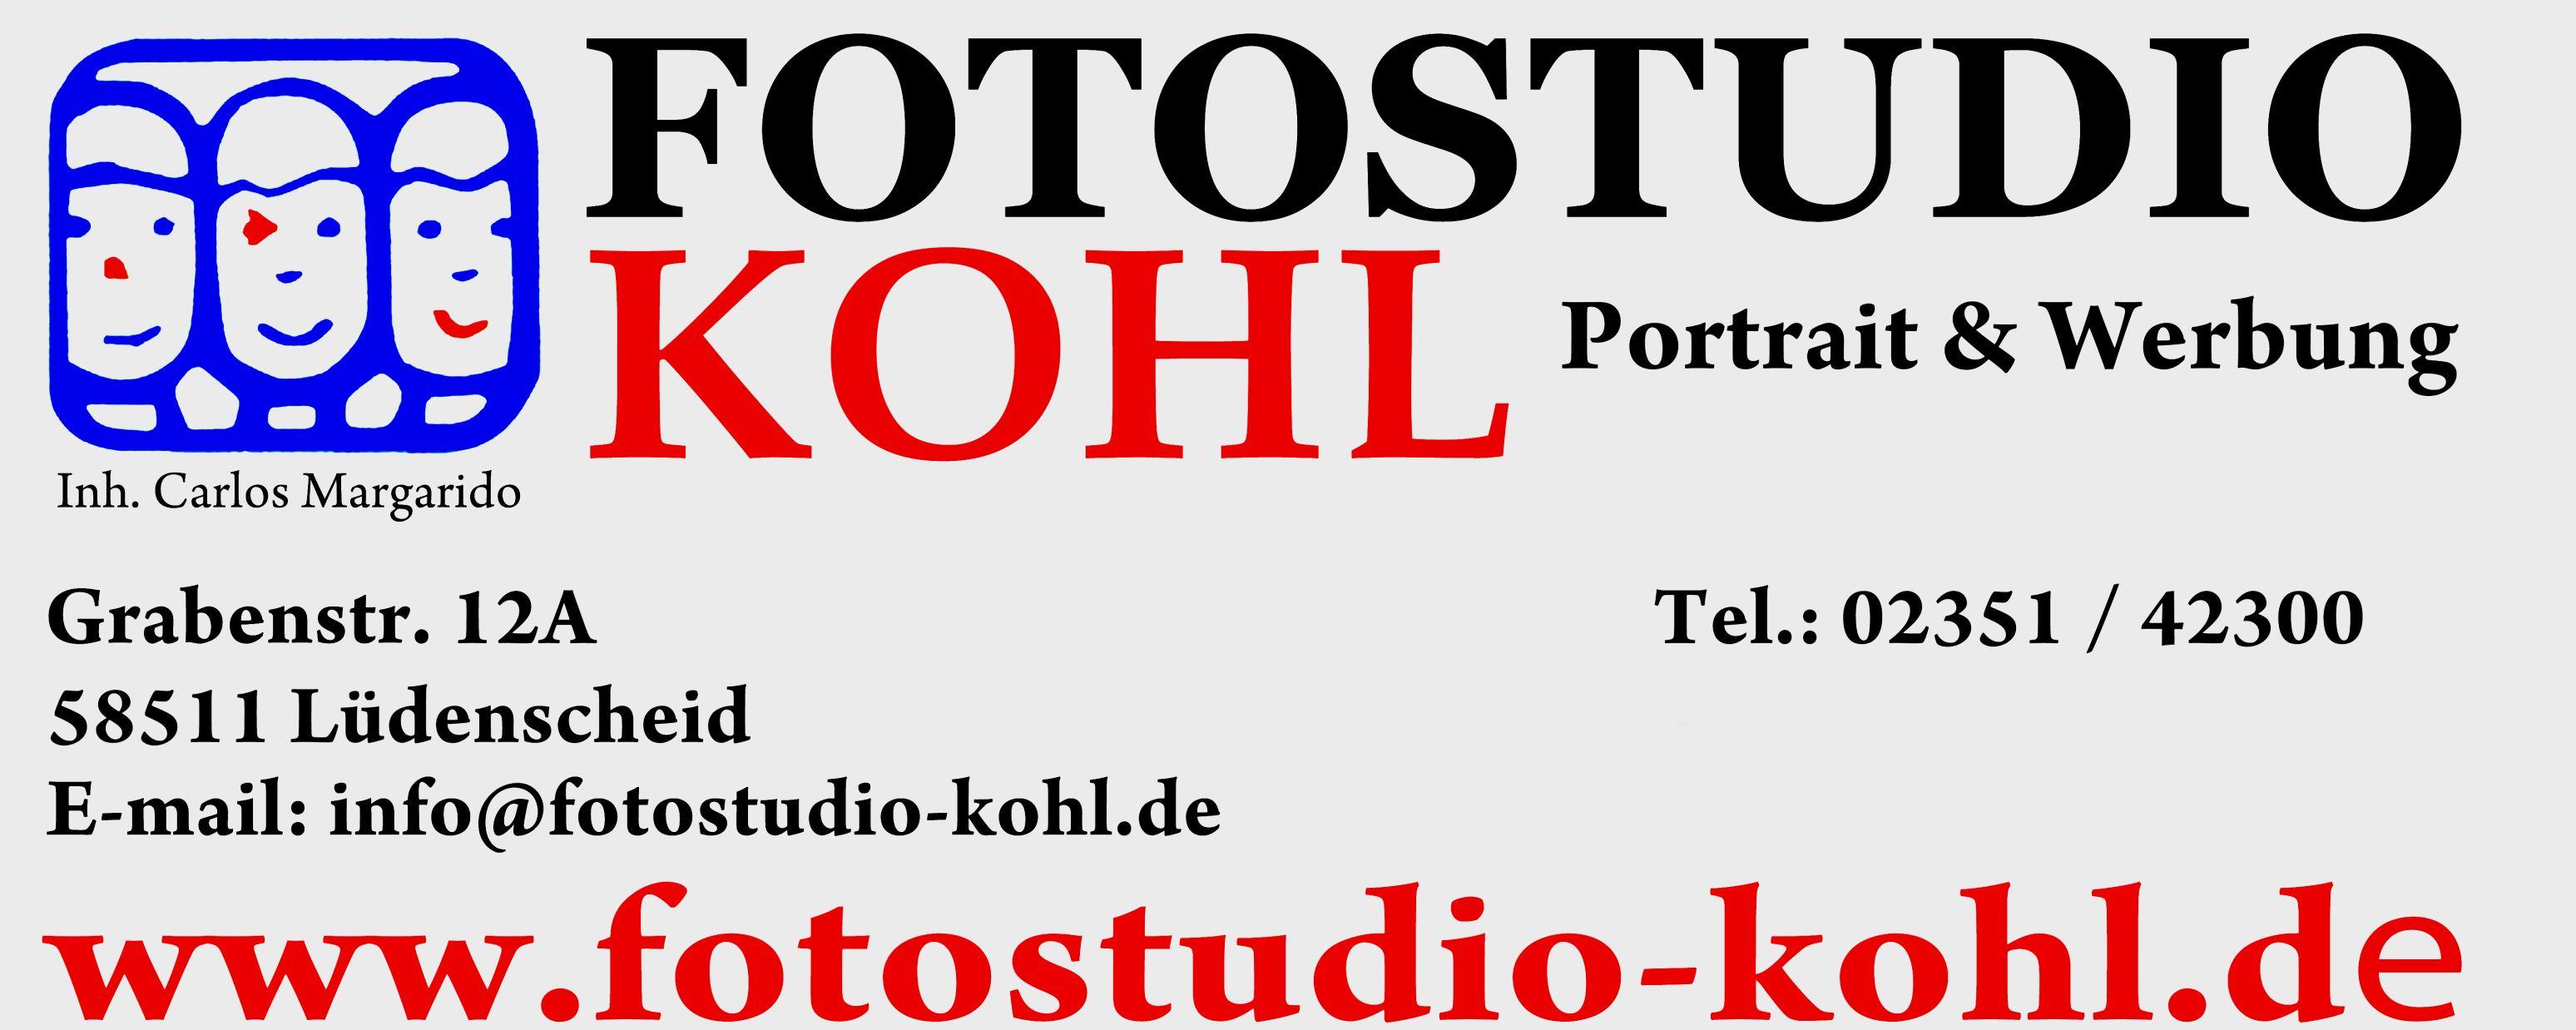 Fotostudio Kohl